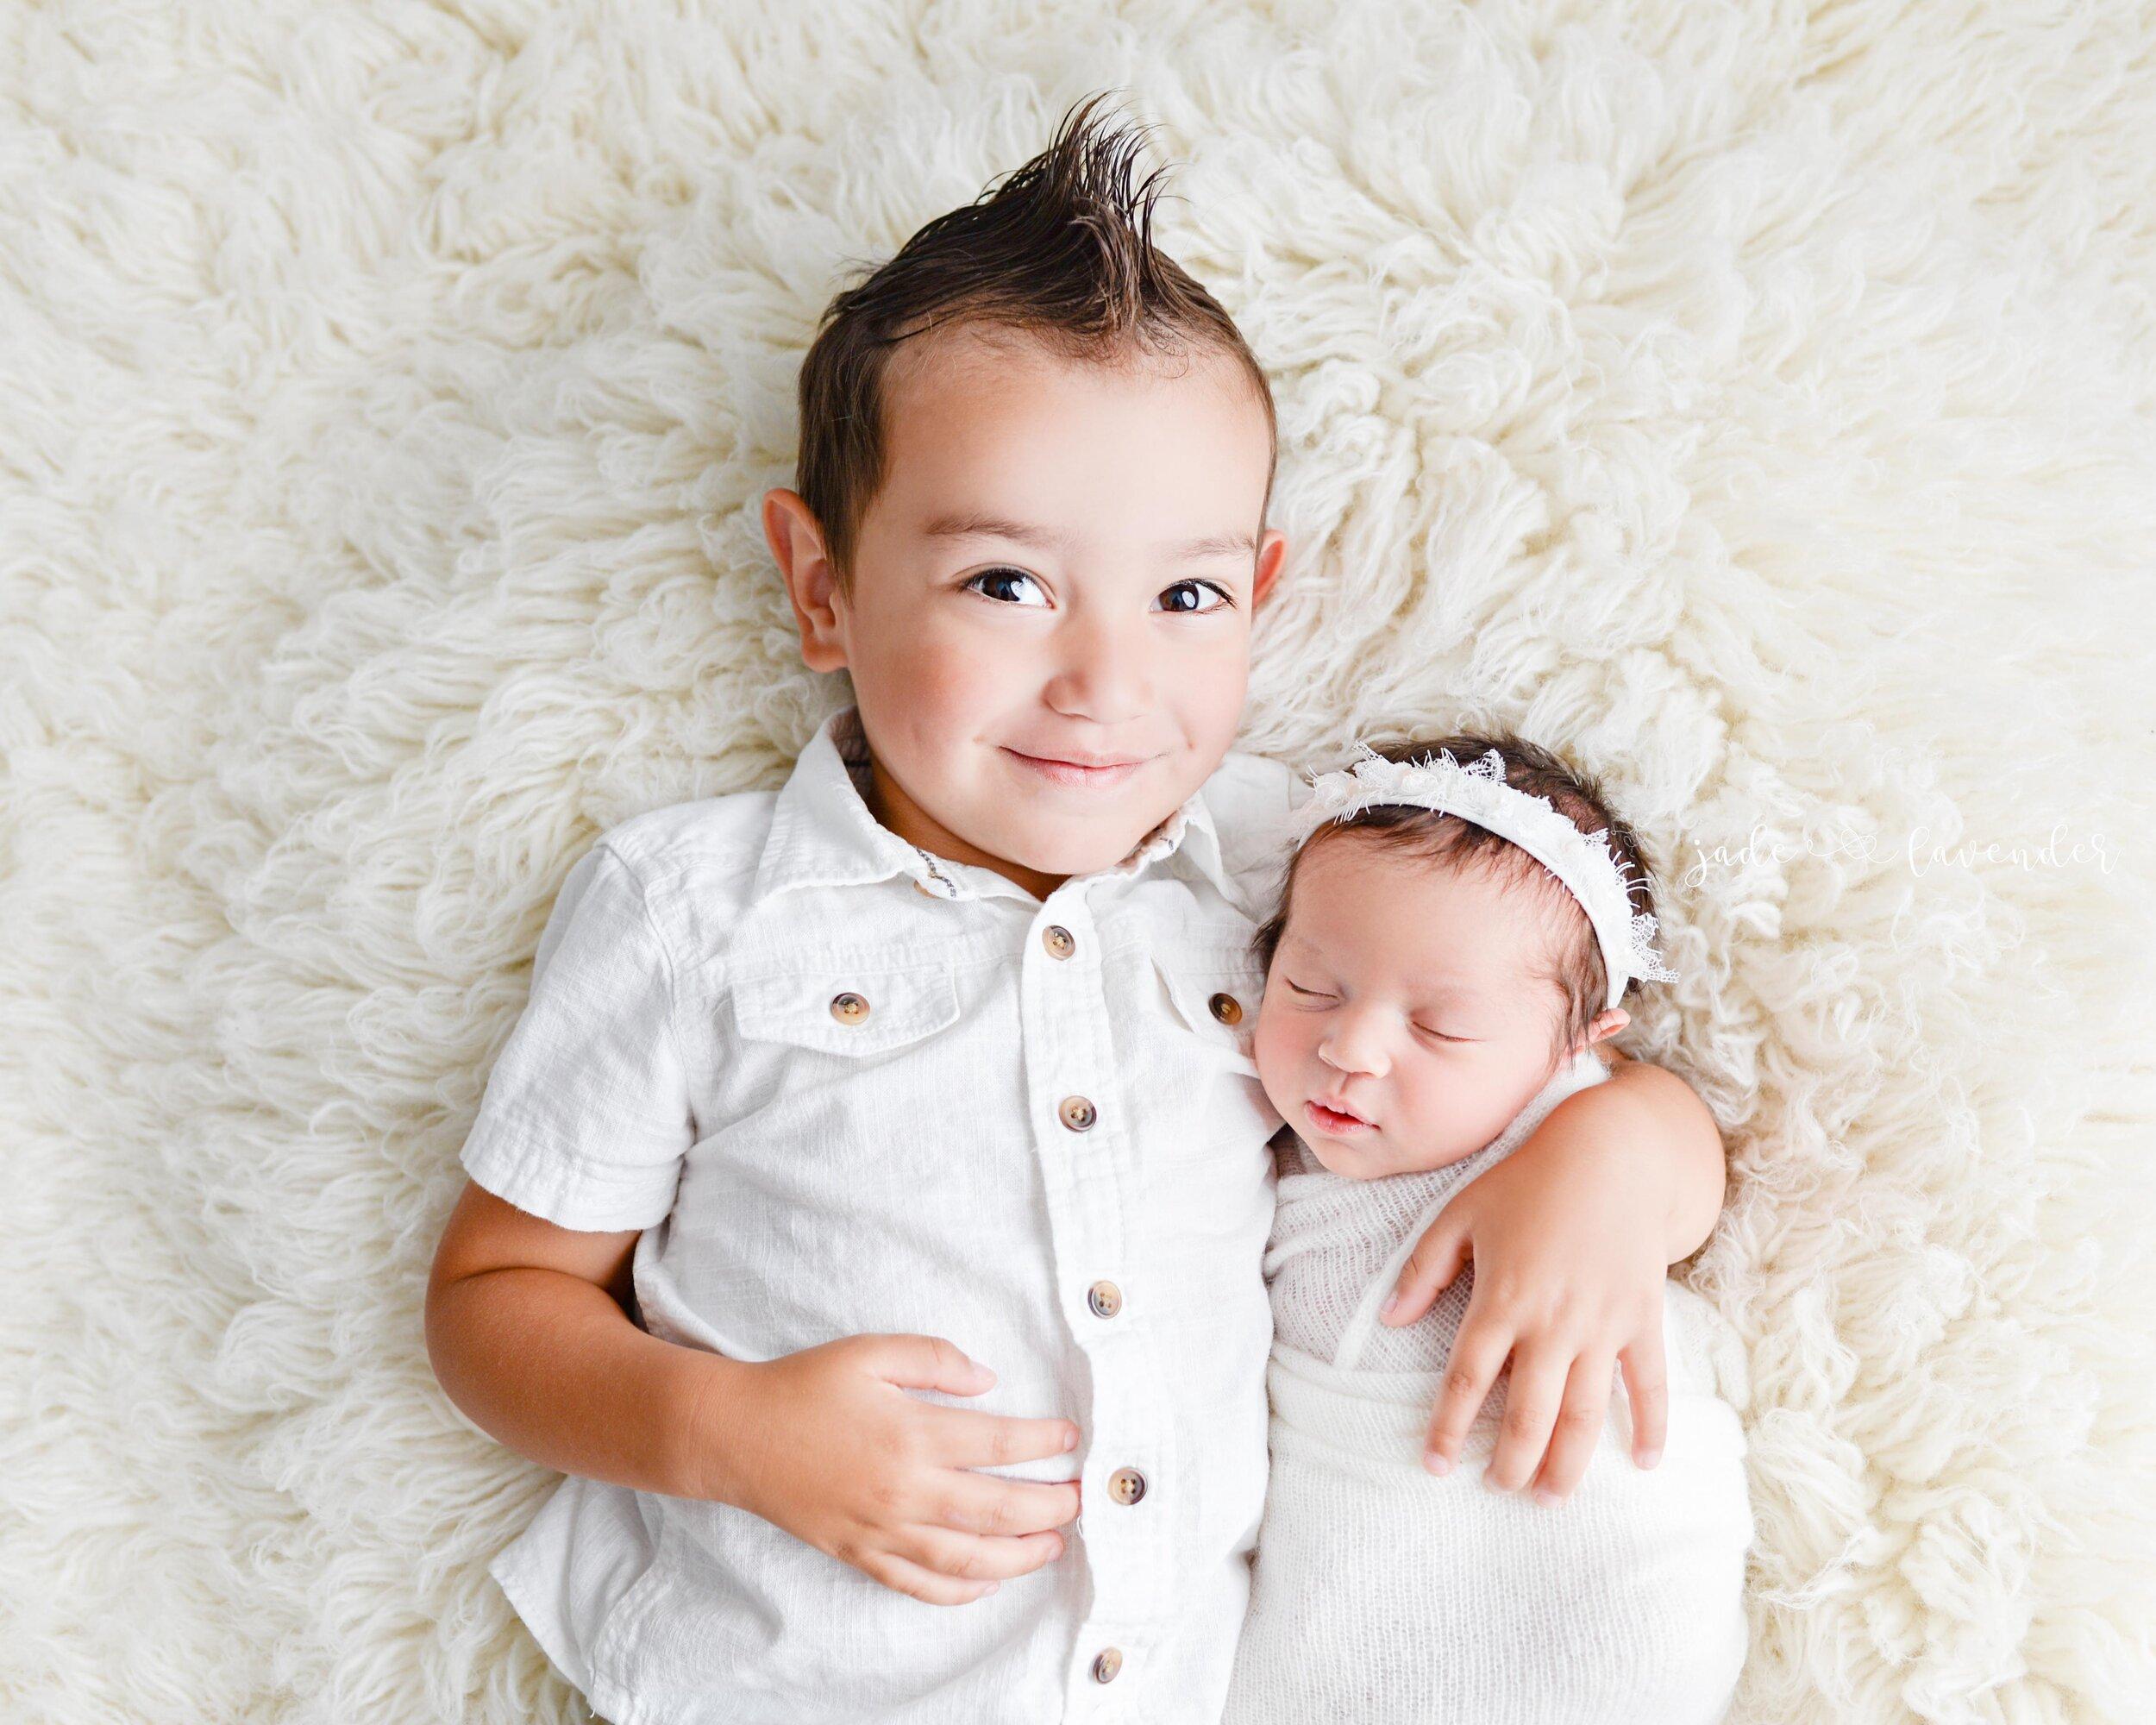 Newborn-images-baby-photography-infant-images-Newborn-photographer-spokane-washington-baby-girl (1 of 11).jpg